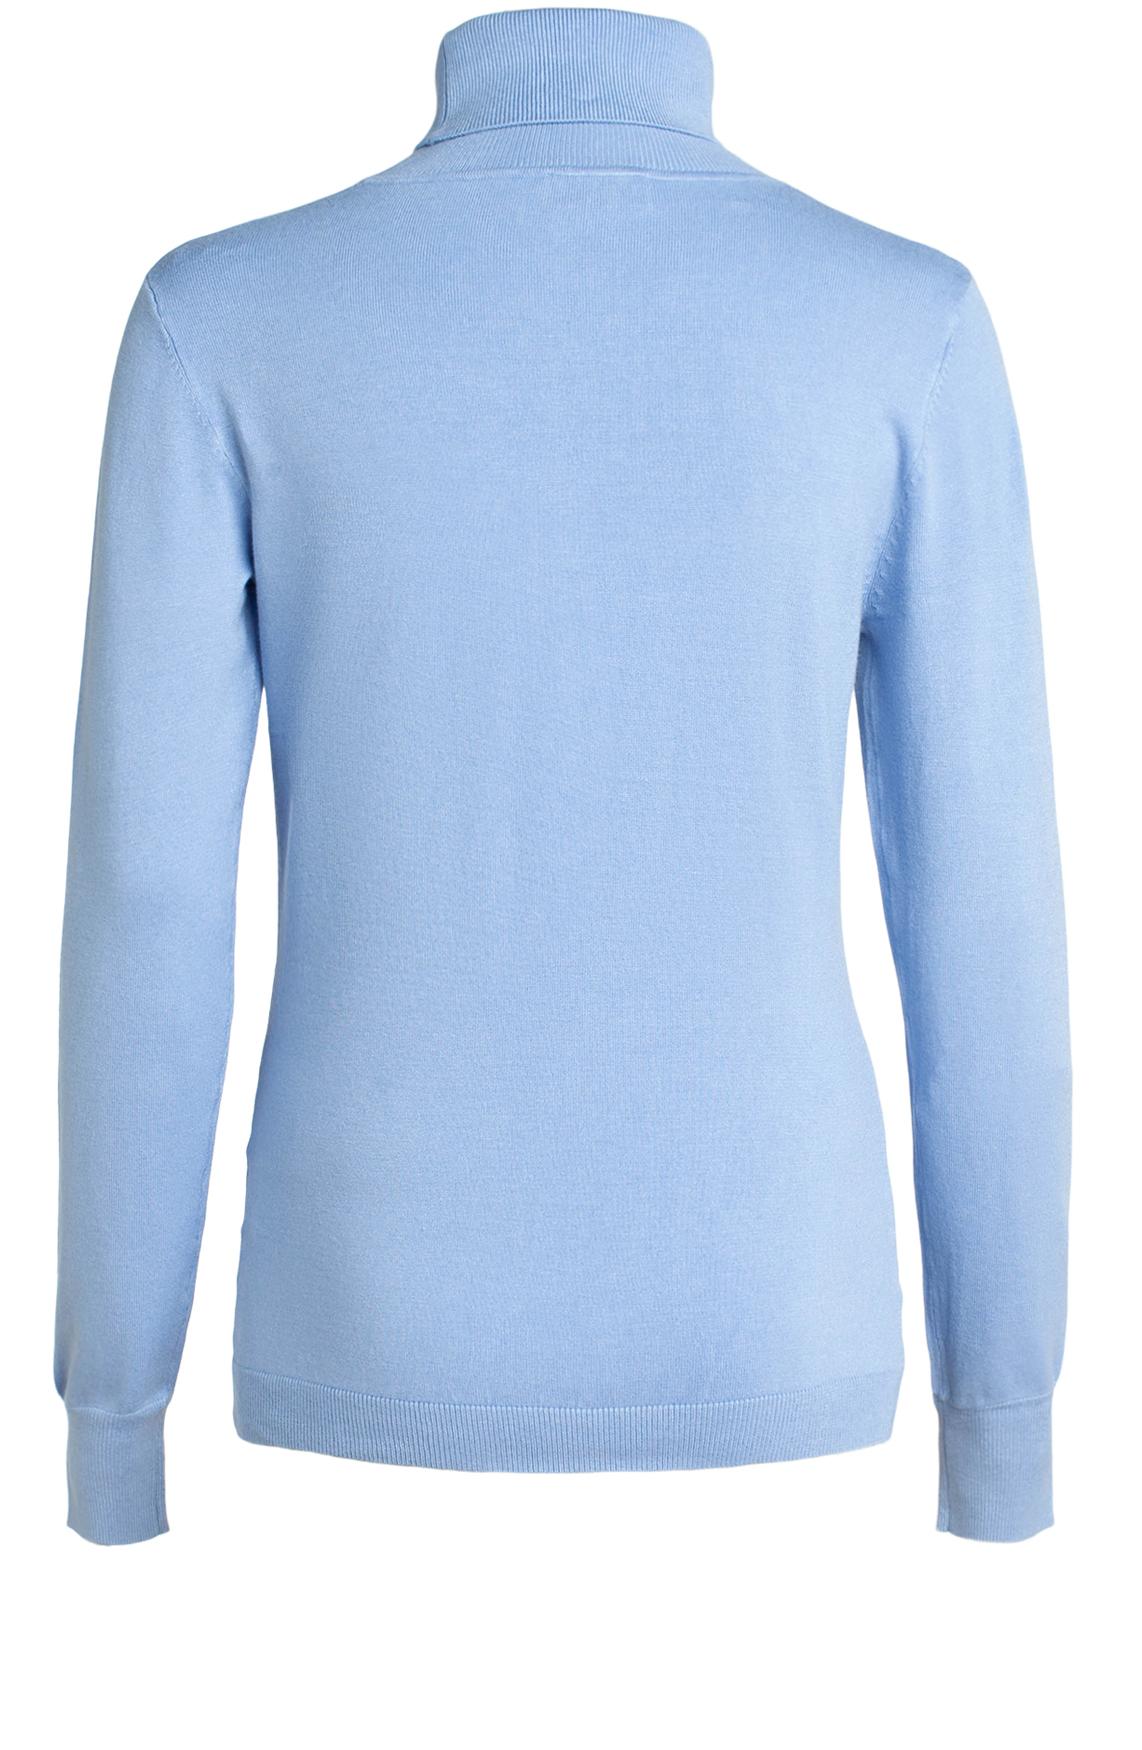 Anna Dames Pullover met col Blauw